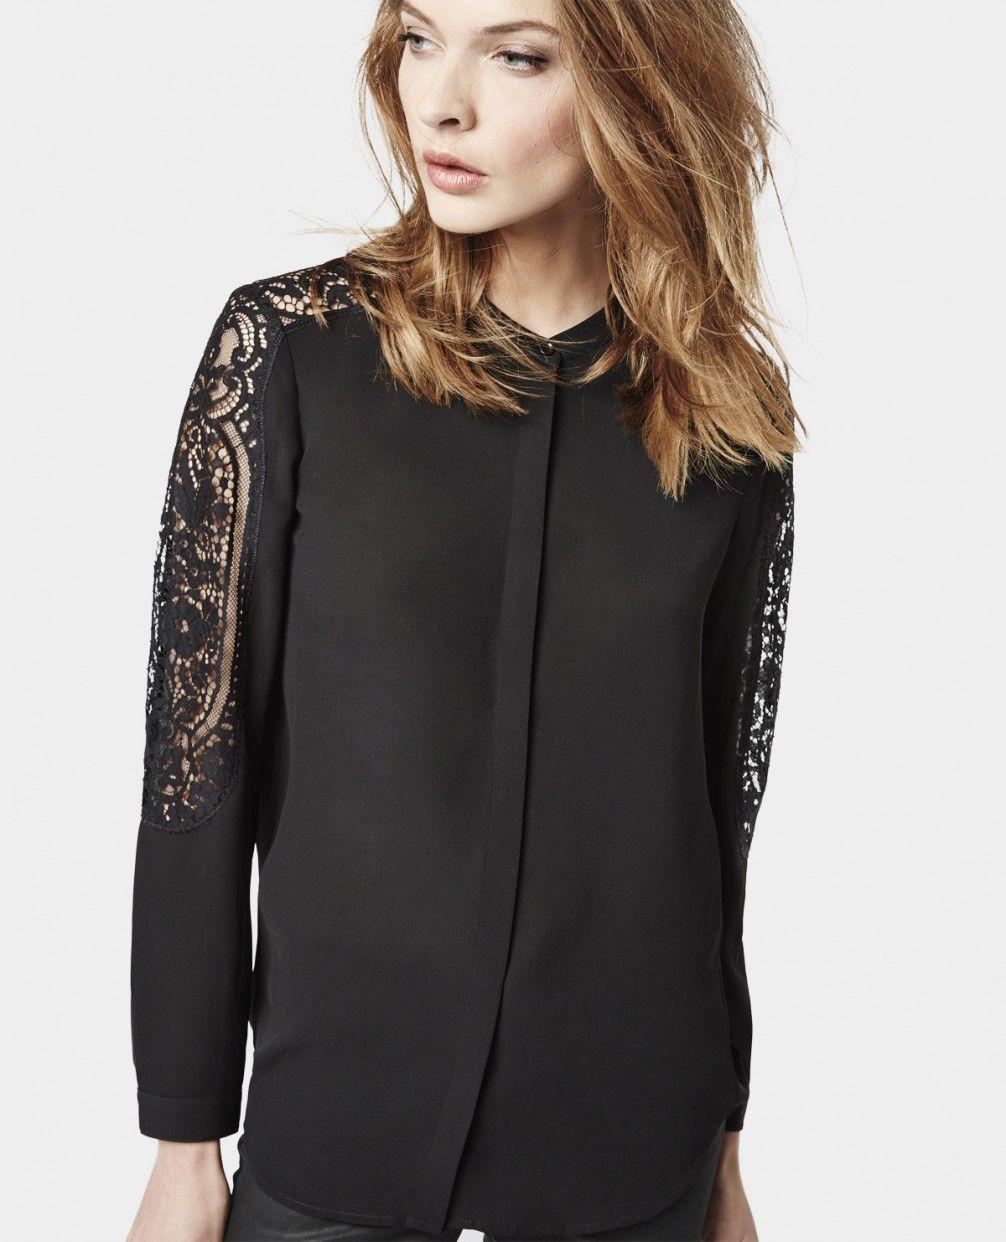 chemise incrustation de dentelle chemises femme the kooples chemise pinterest. Black Bedroom Furniture Sets. Home Design Ideas